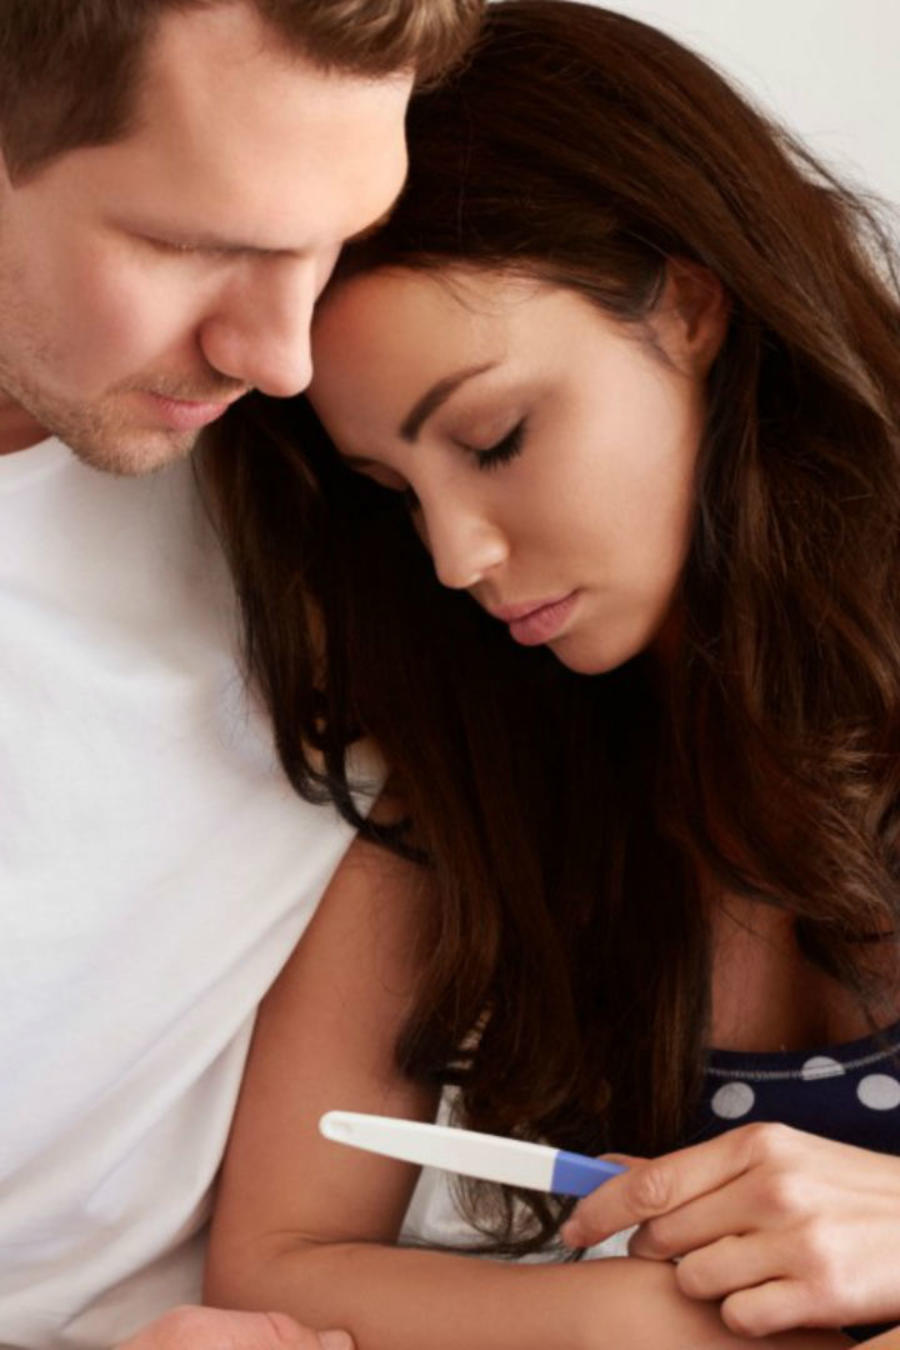 Pareja viendo prueba de embarazo